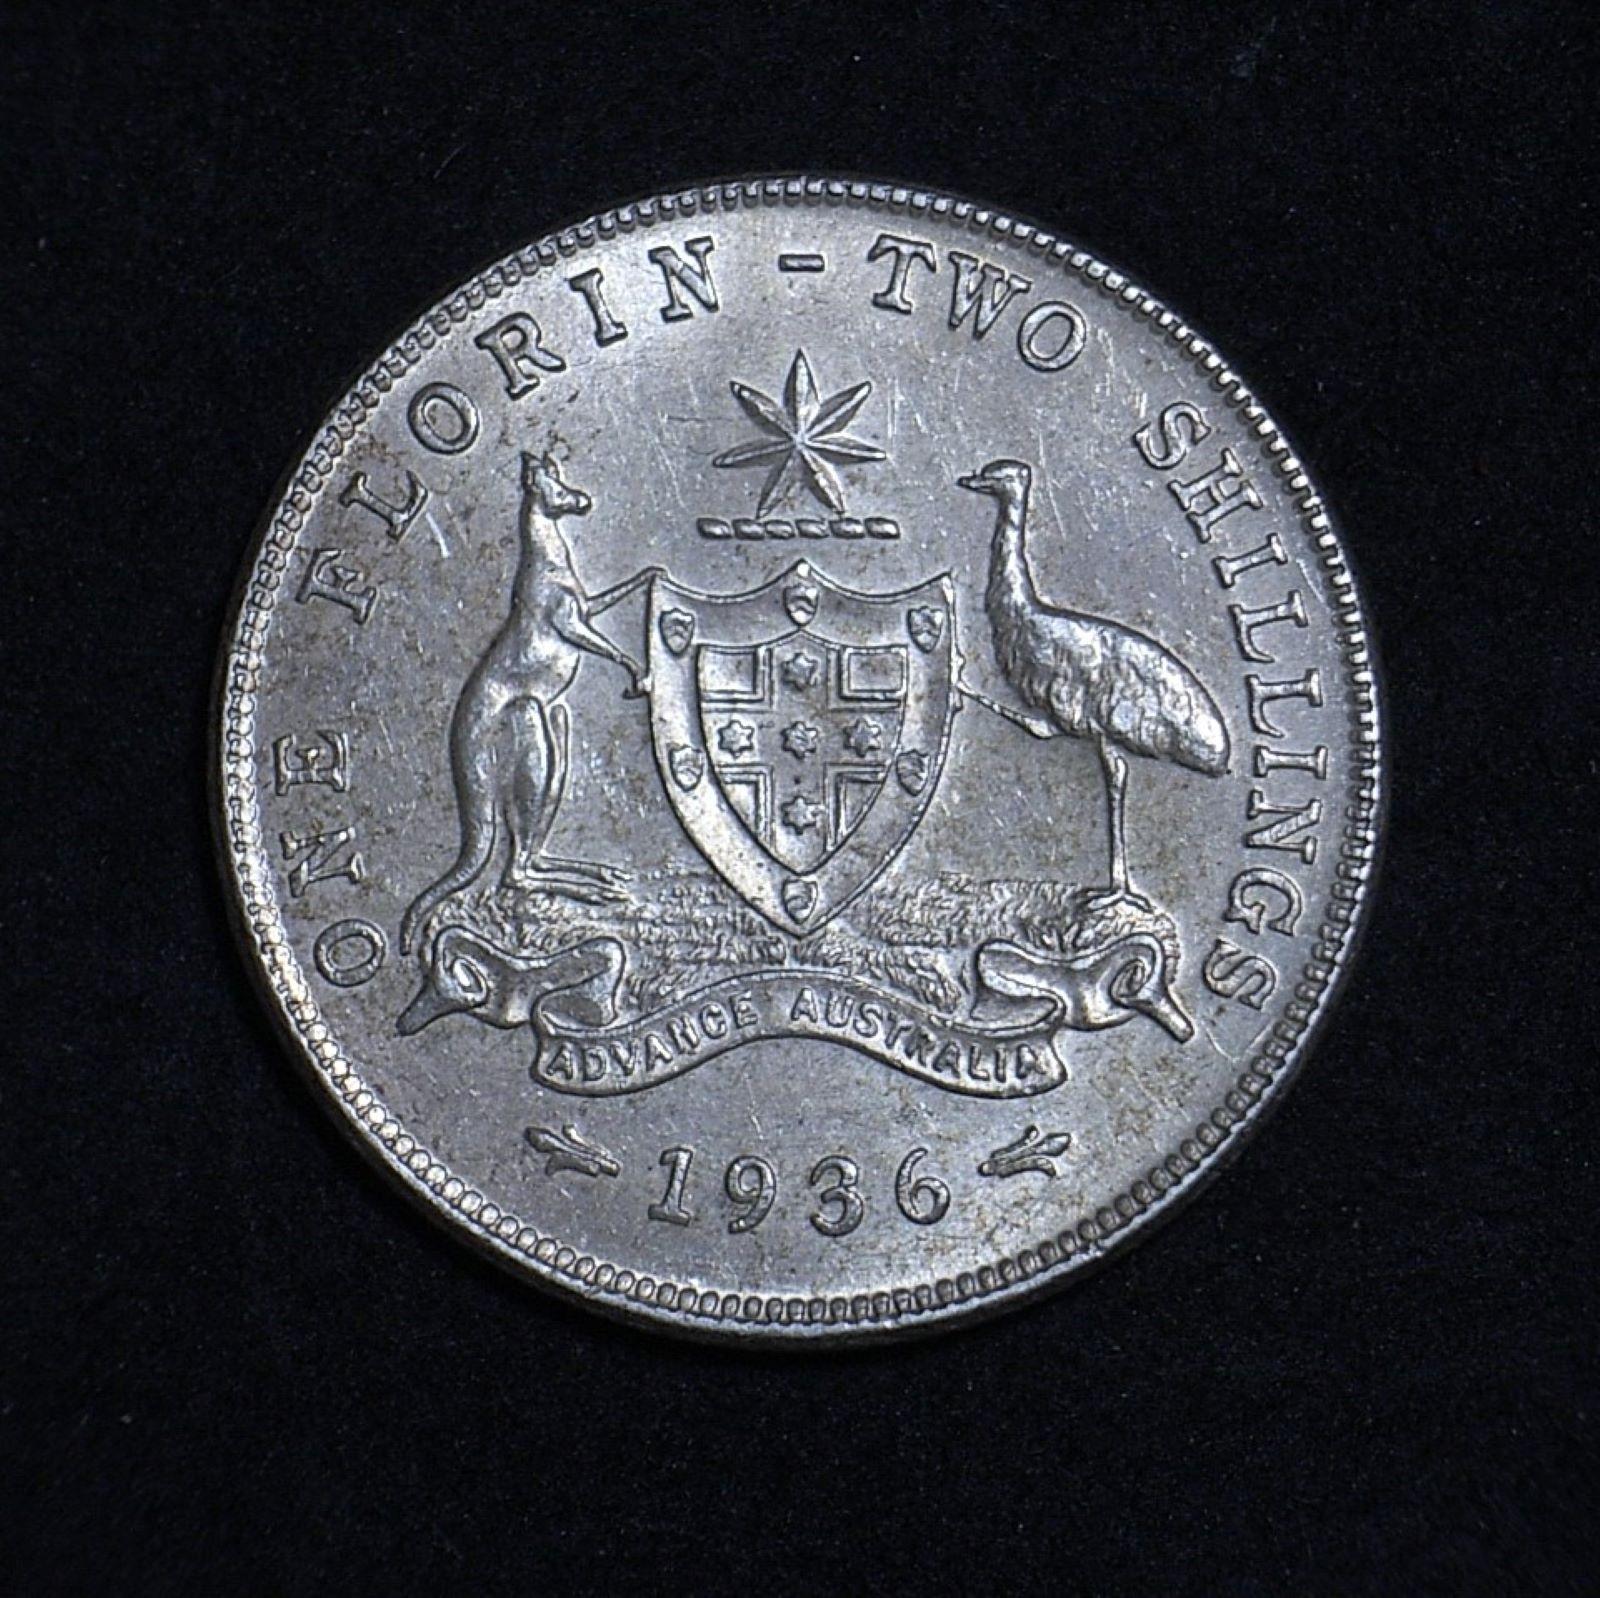 aus-florin-1936-rev-3